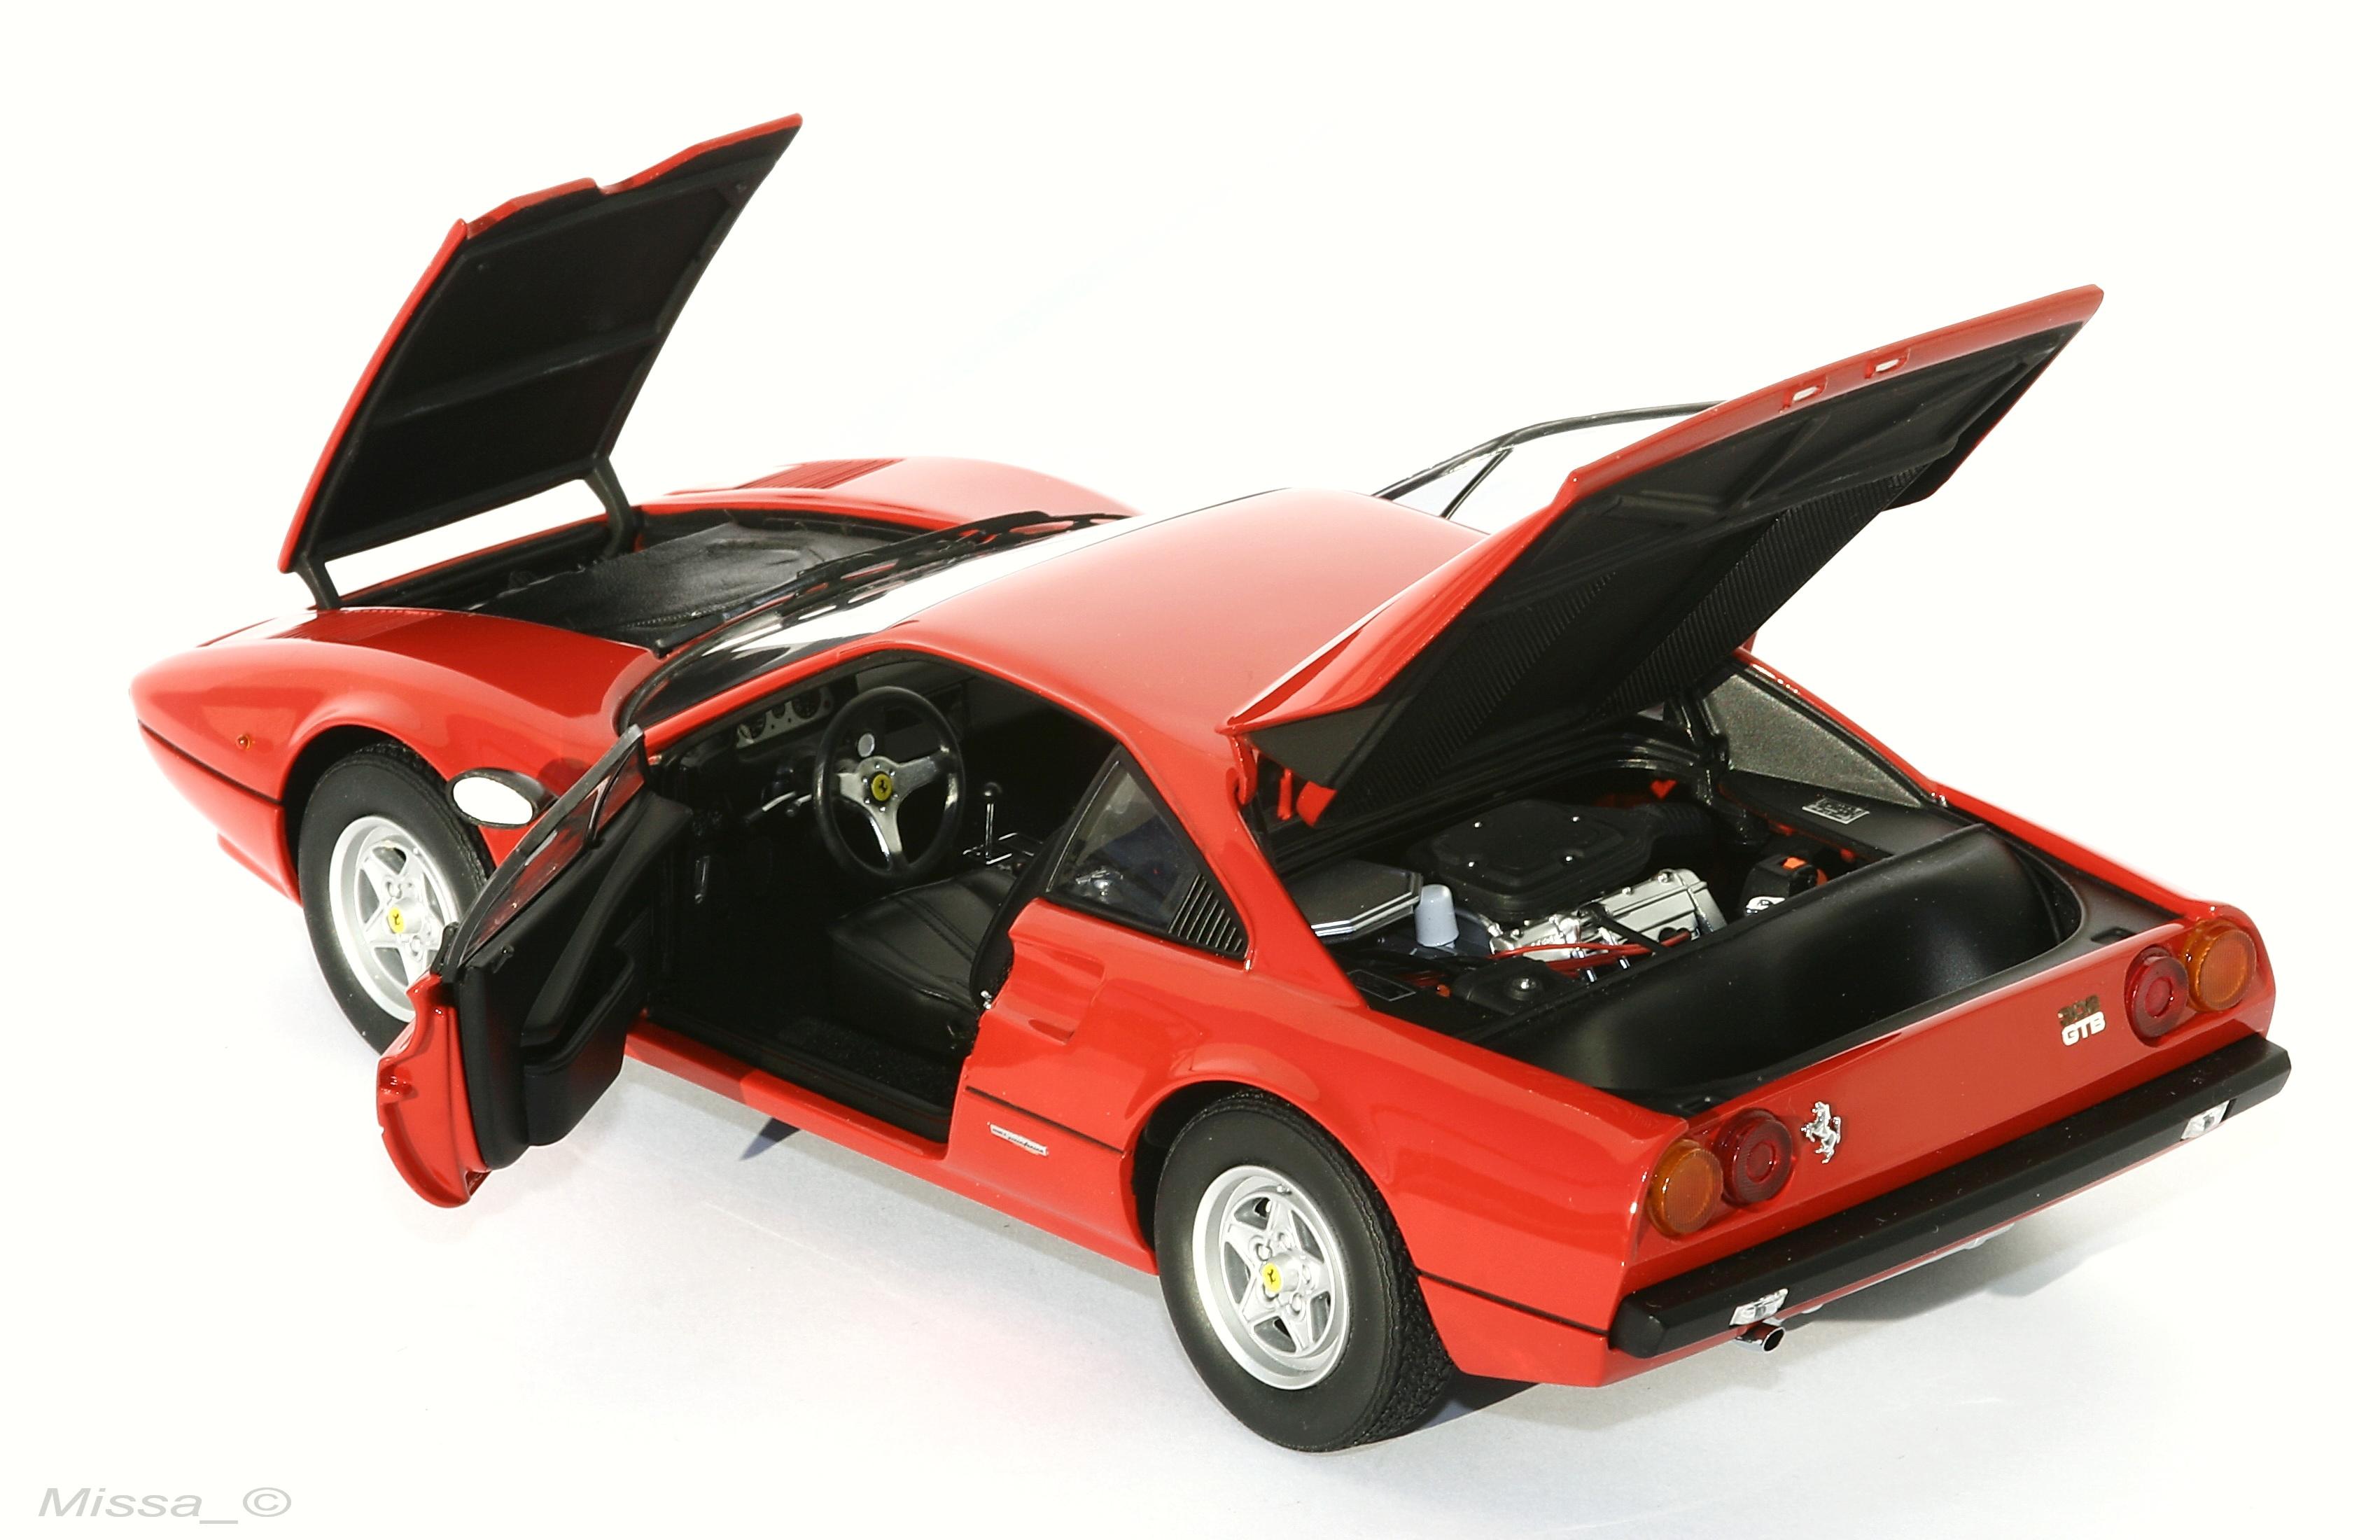 018_kyosho_ferrari308slx4v Fabulous Ferrari Mondial 8 Super Elite Cars Trend